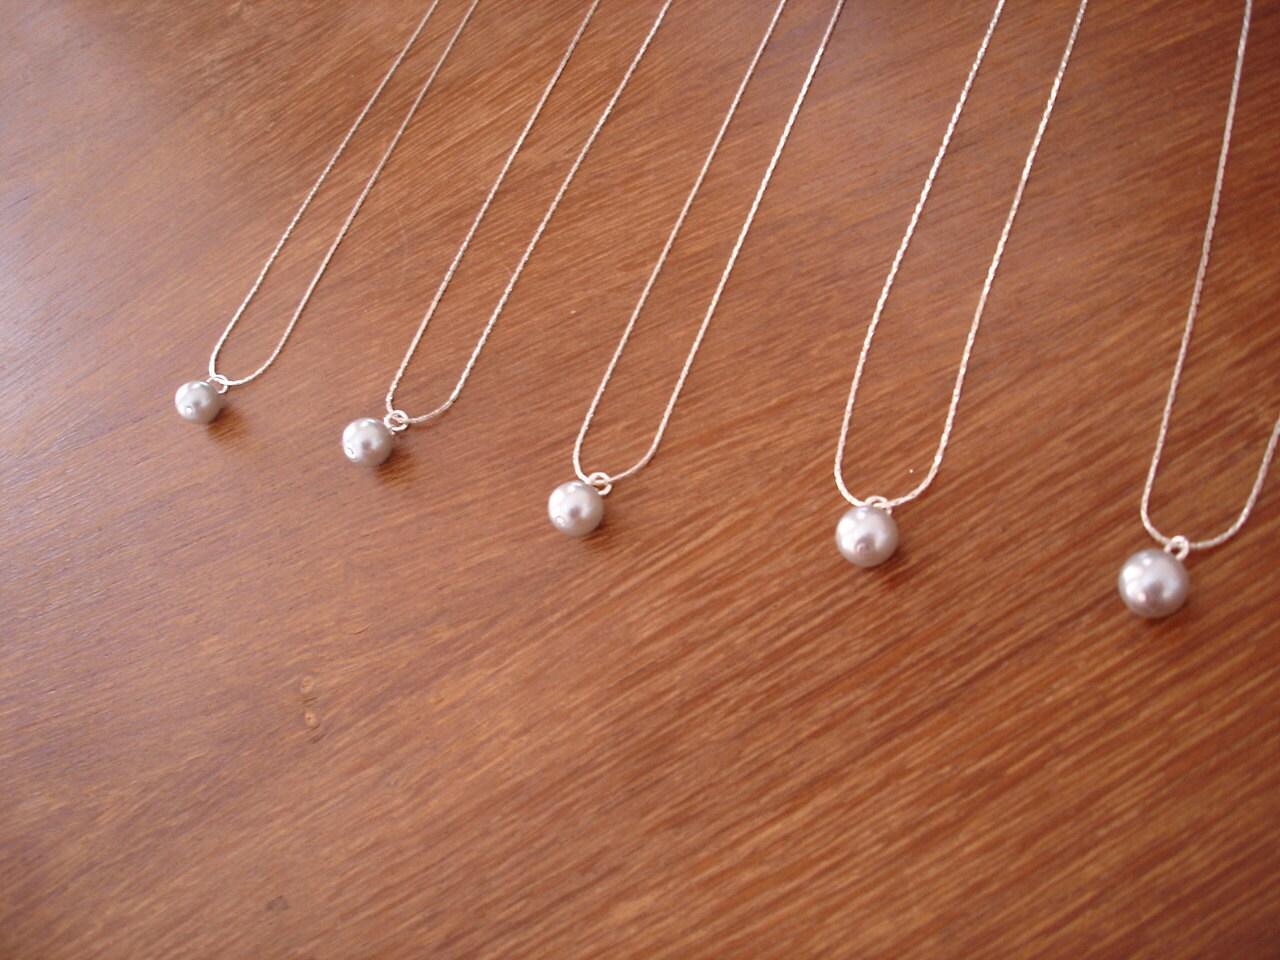 Wedding Bridesmaid Necklaces 9 single pearl bridesmaid gift necklaces ivory white grey